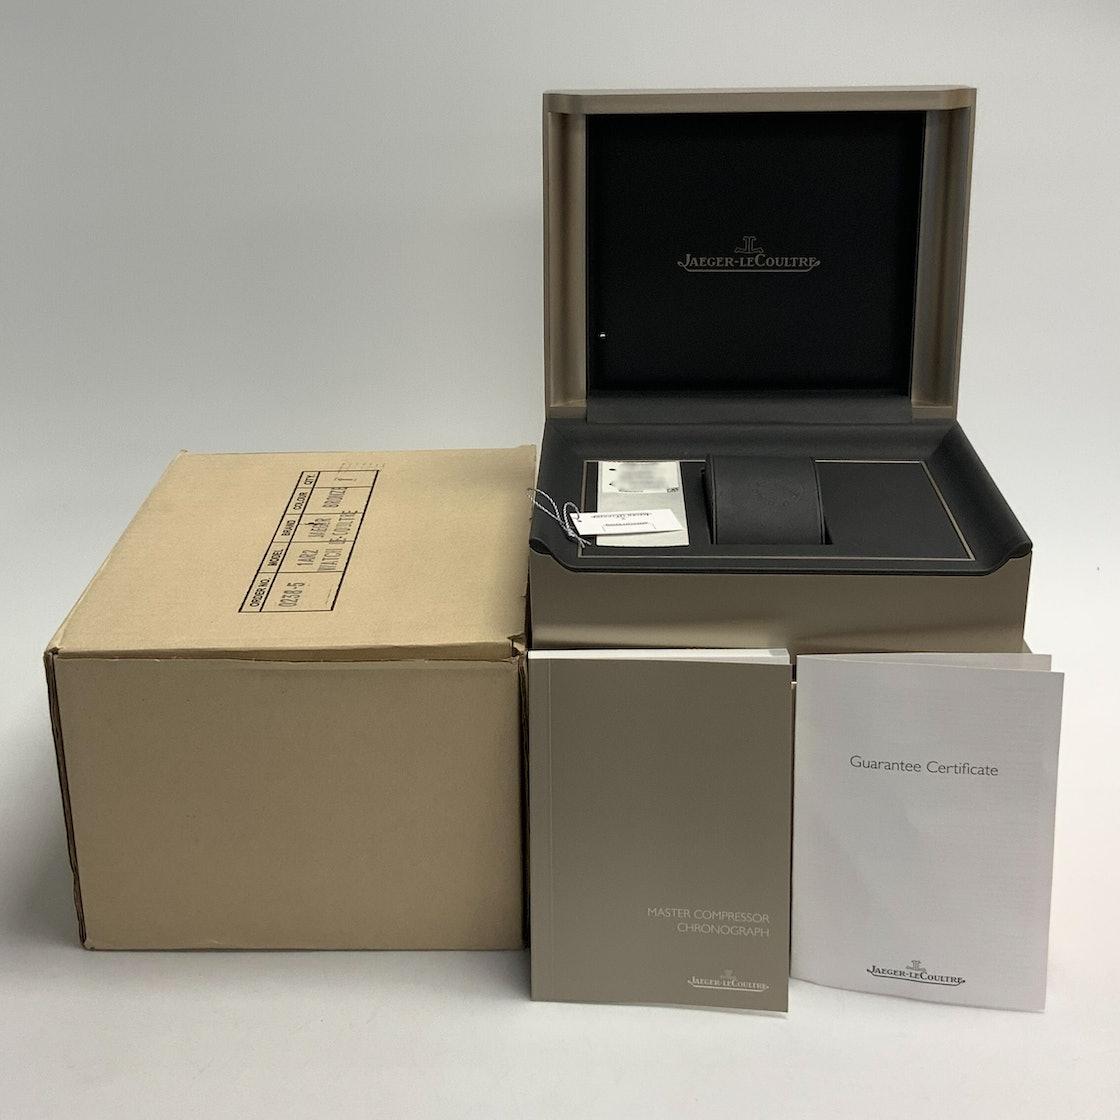 Jaeger-LeCoultre Master Compressor Chronograph Q1752421